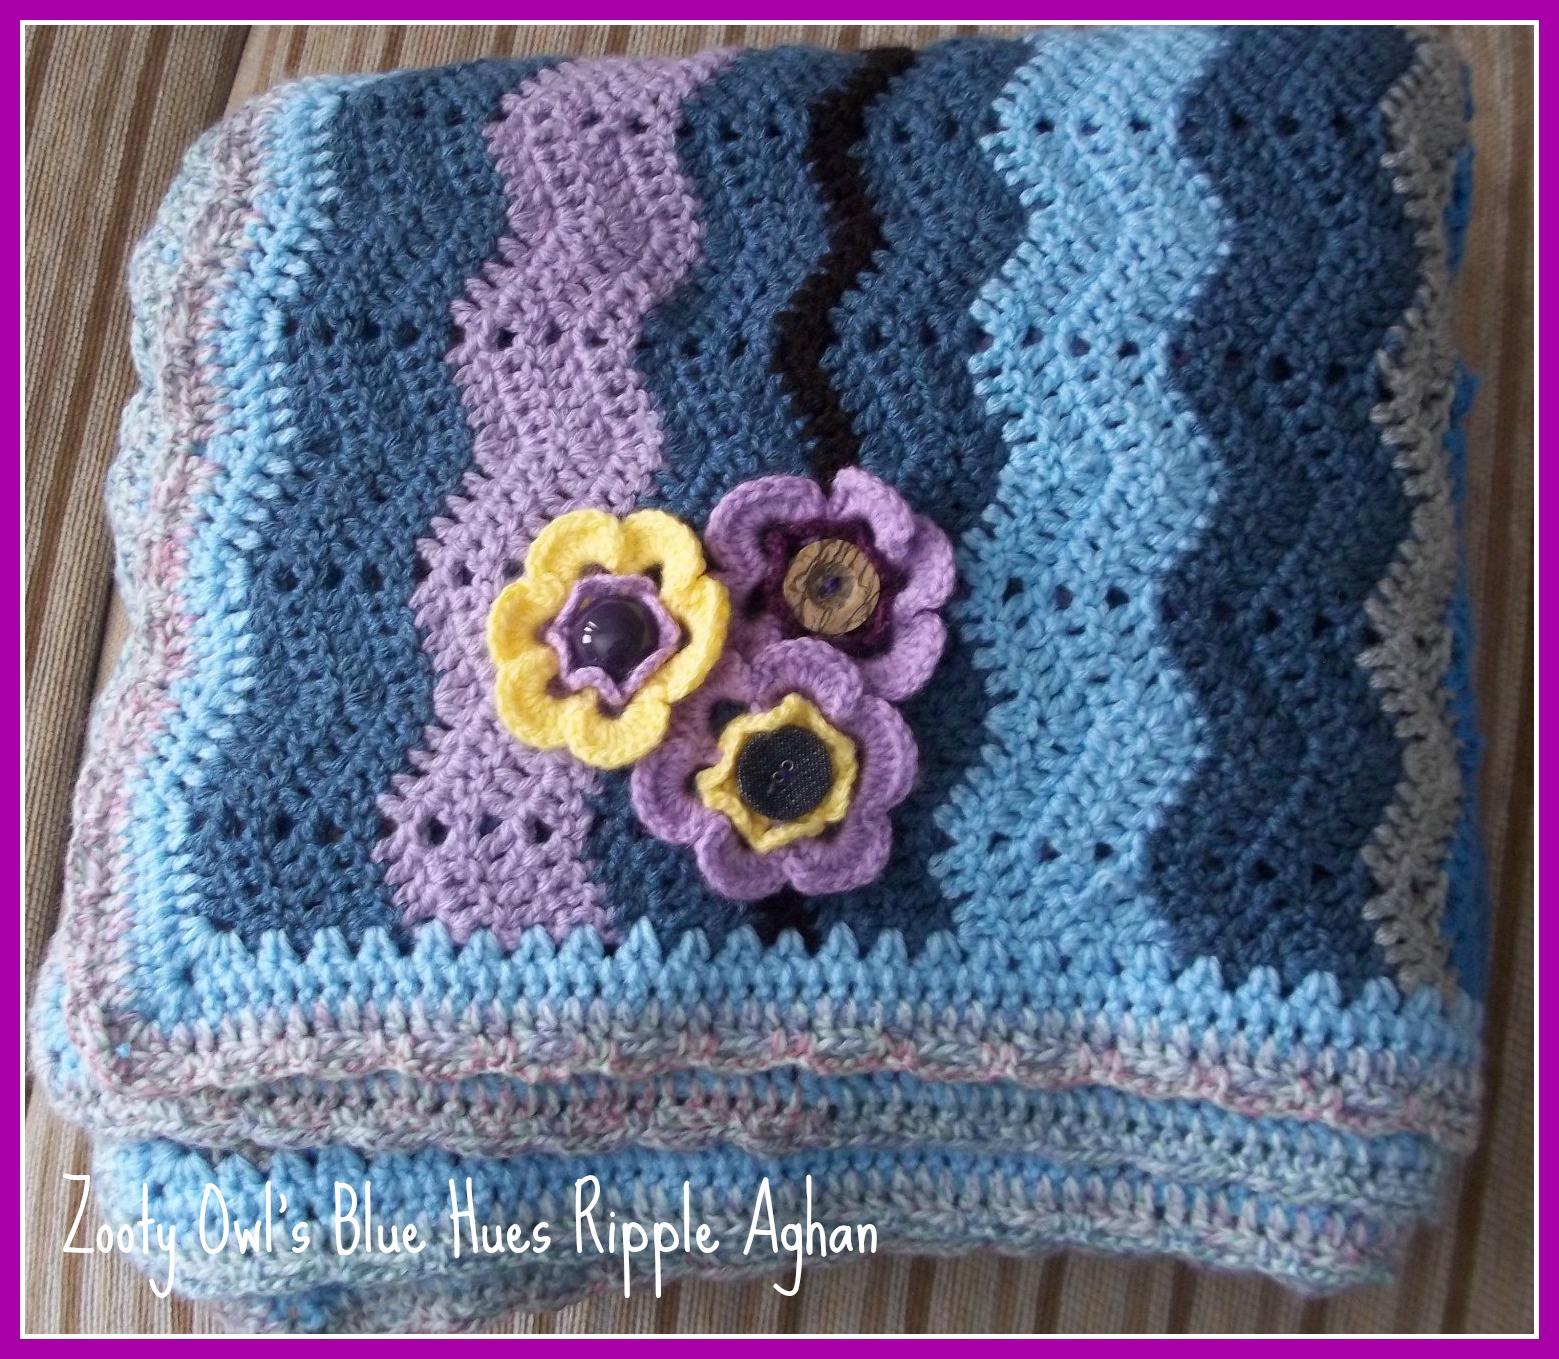 Zooty Owl\'s Crafty Blog: Ripple Crochet Afghan: Blue Hues